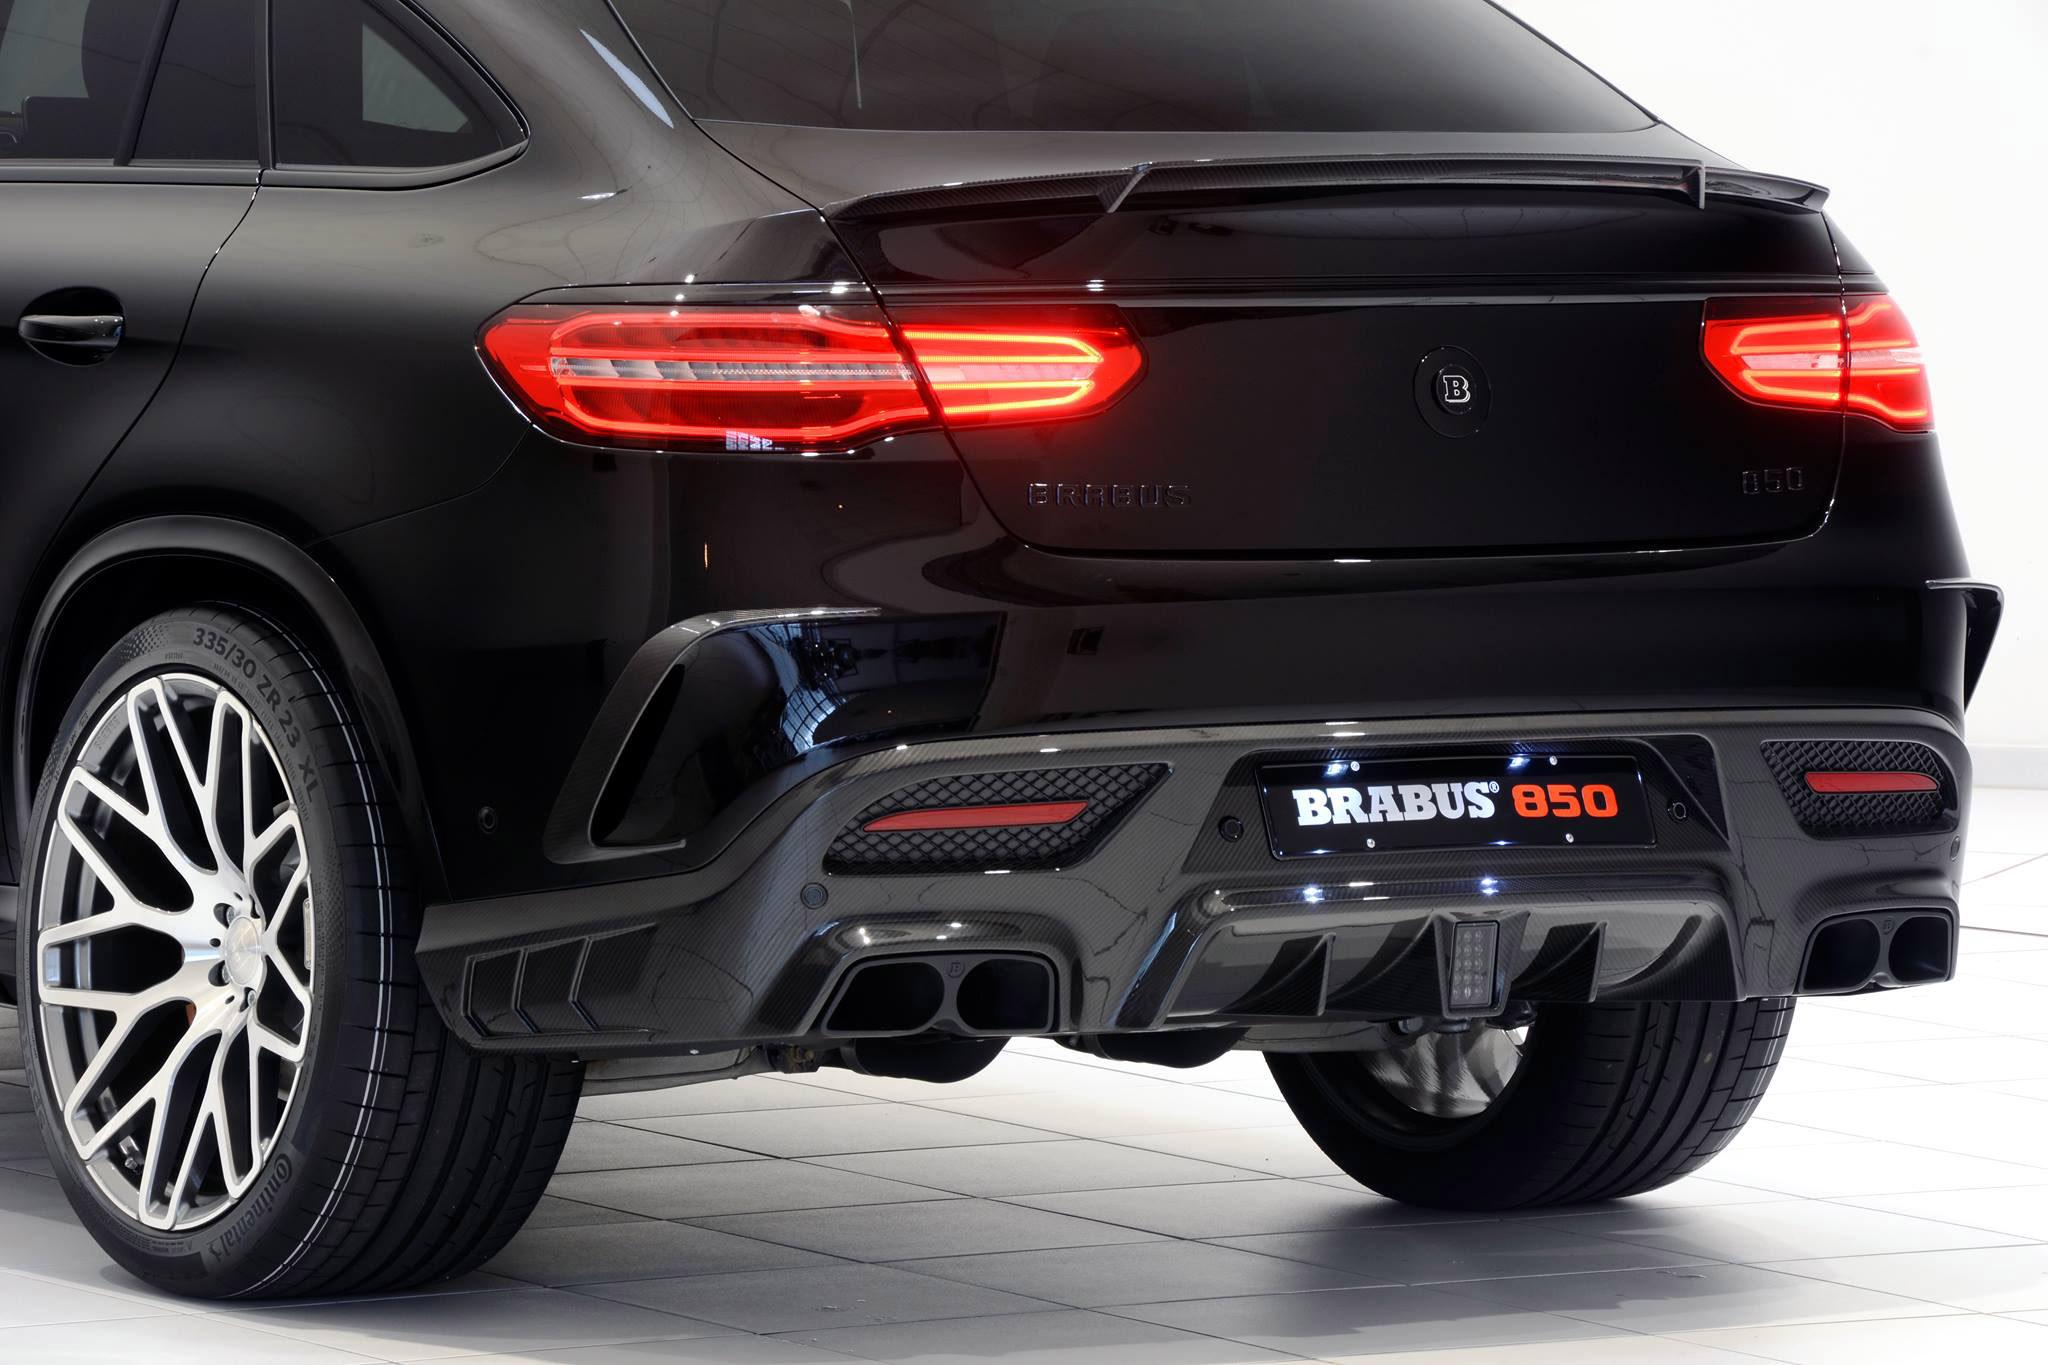 BRABUS GLE 850 6.0 Biturbo Coupe - Cold Start &amp- REVS! - YouTube